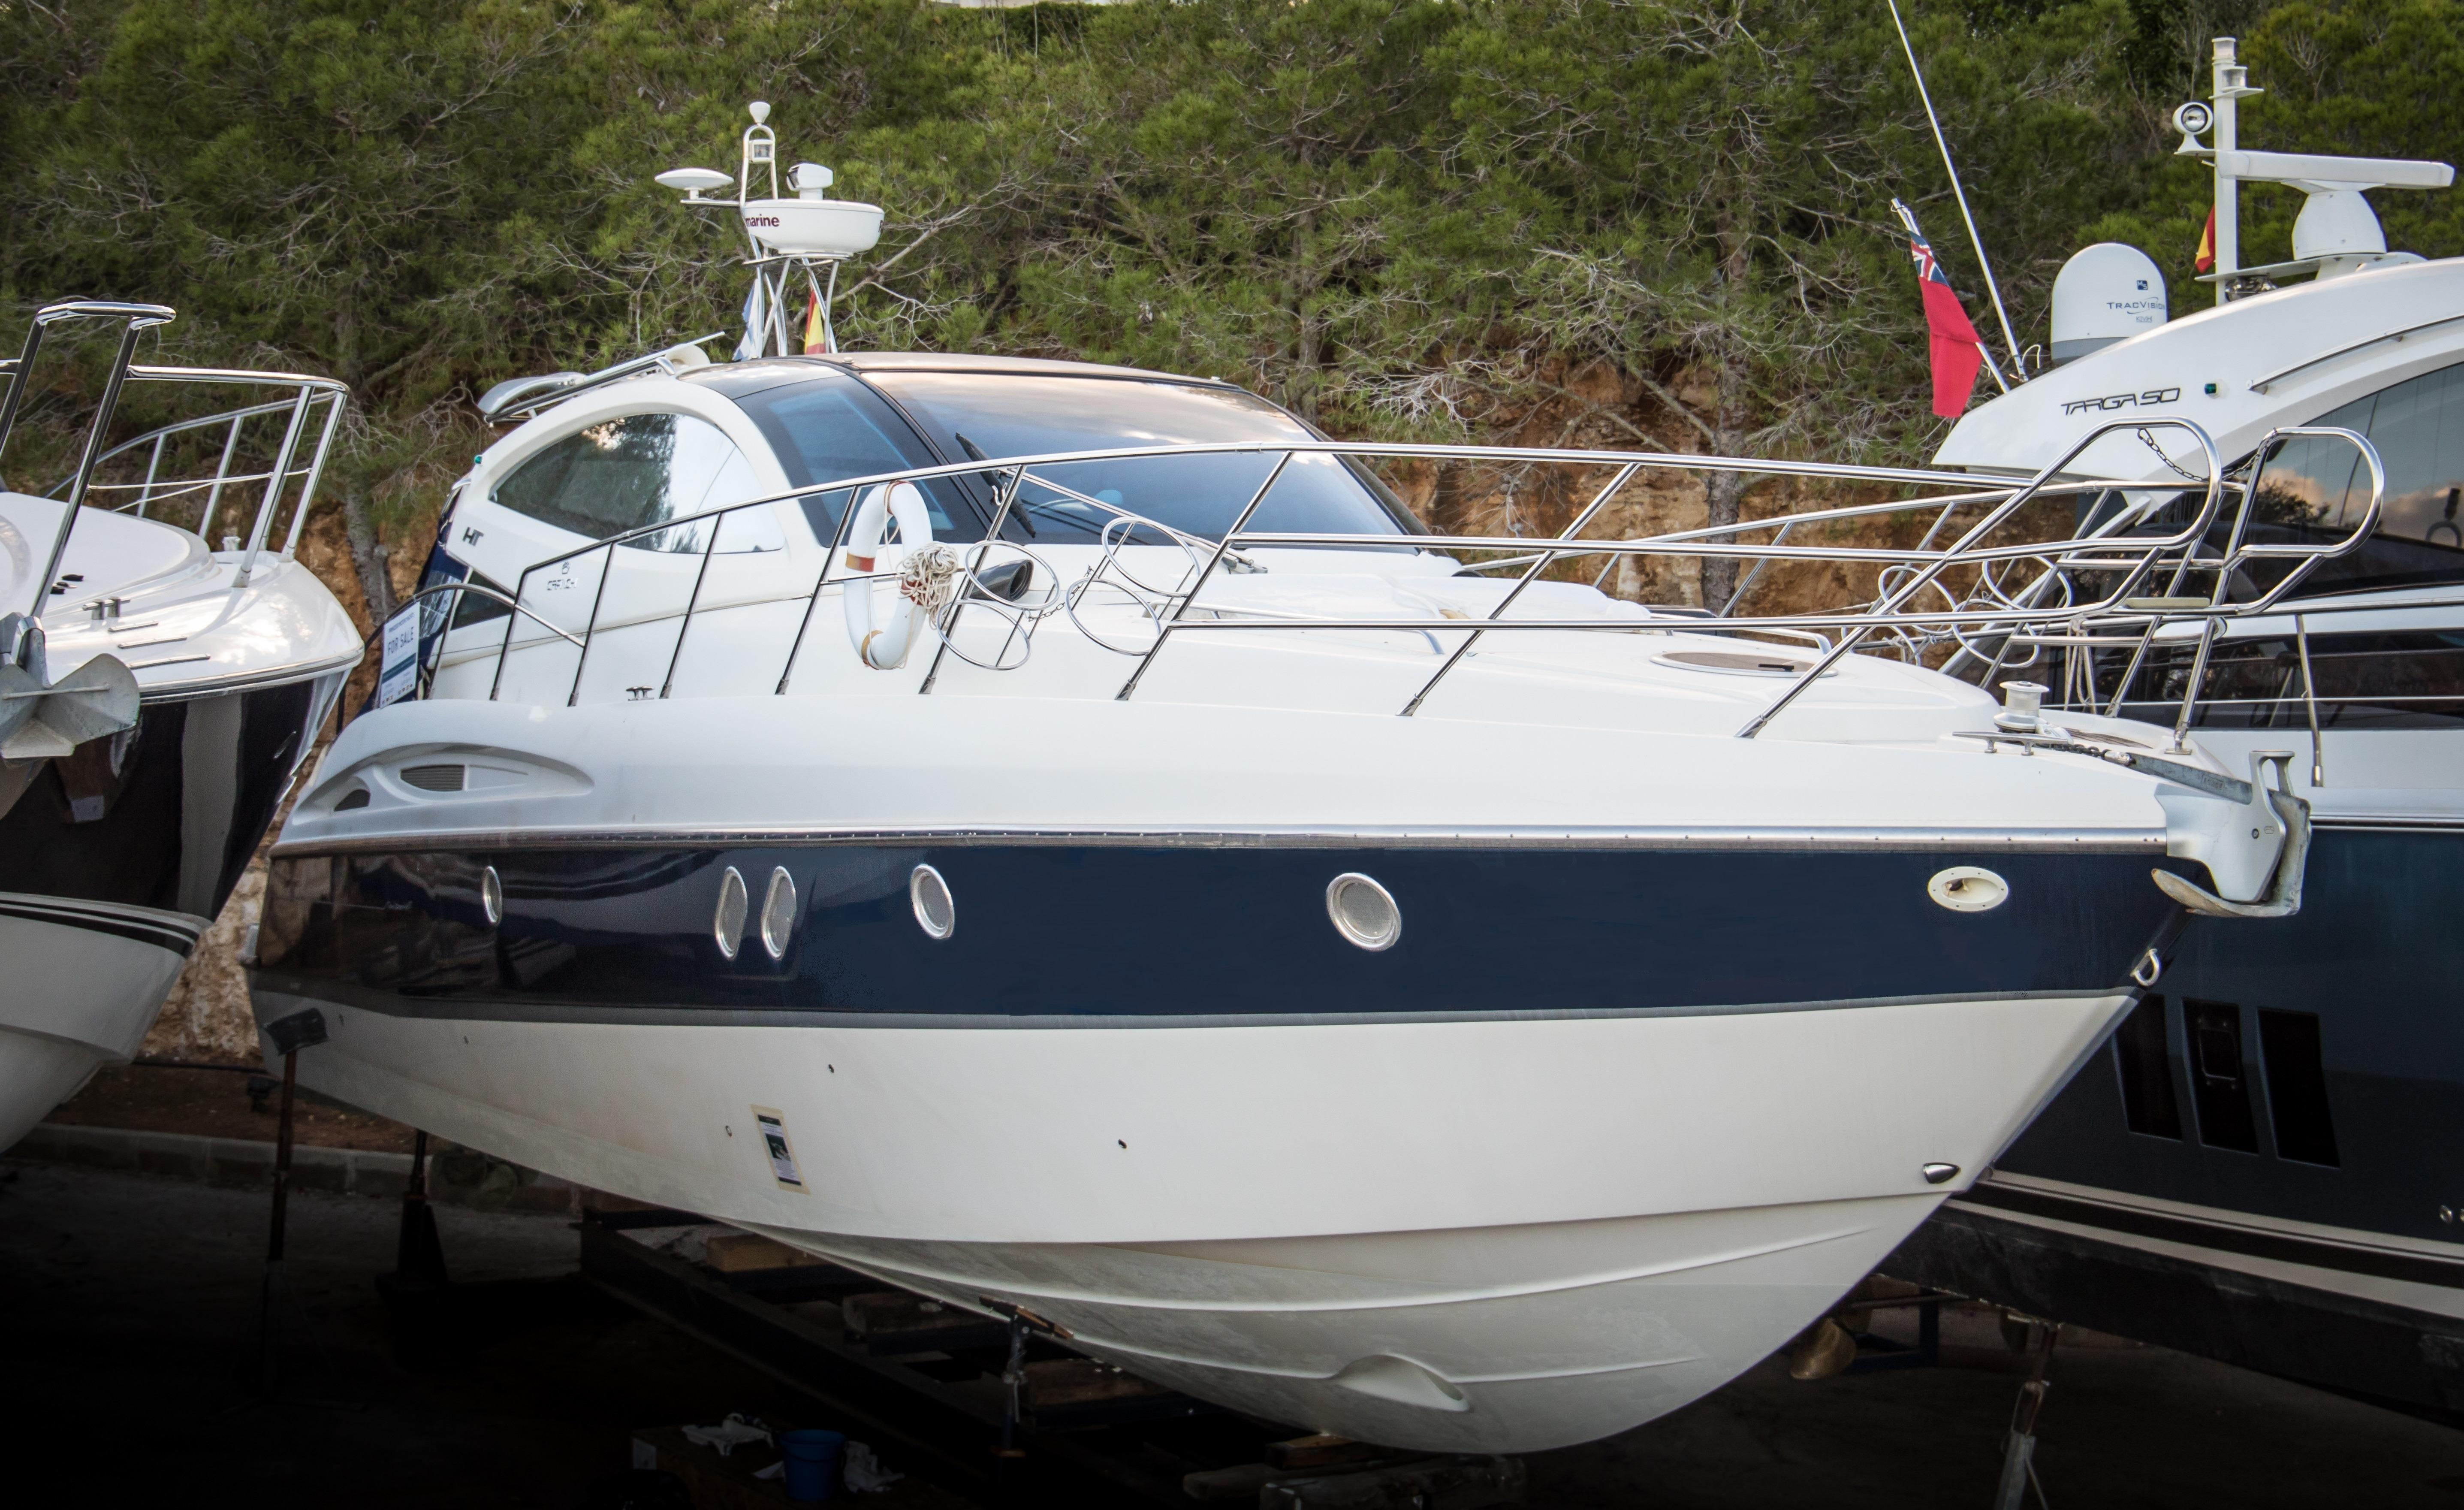 Yacht Sales: Yacht Sales Recruitment